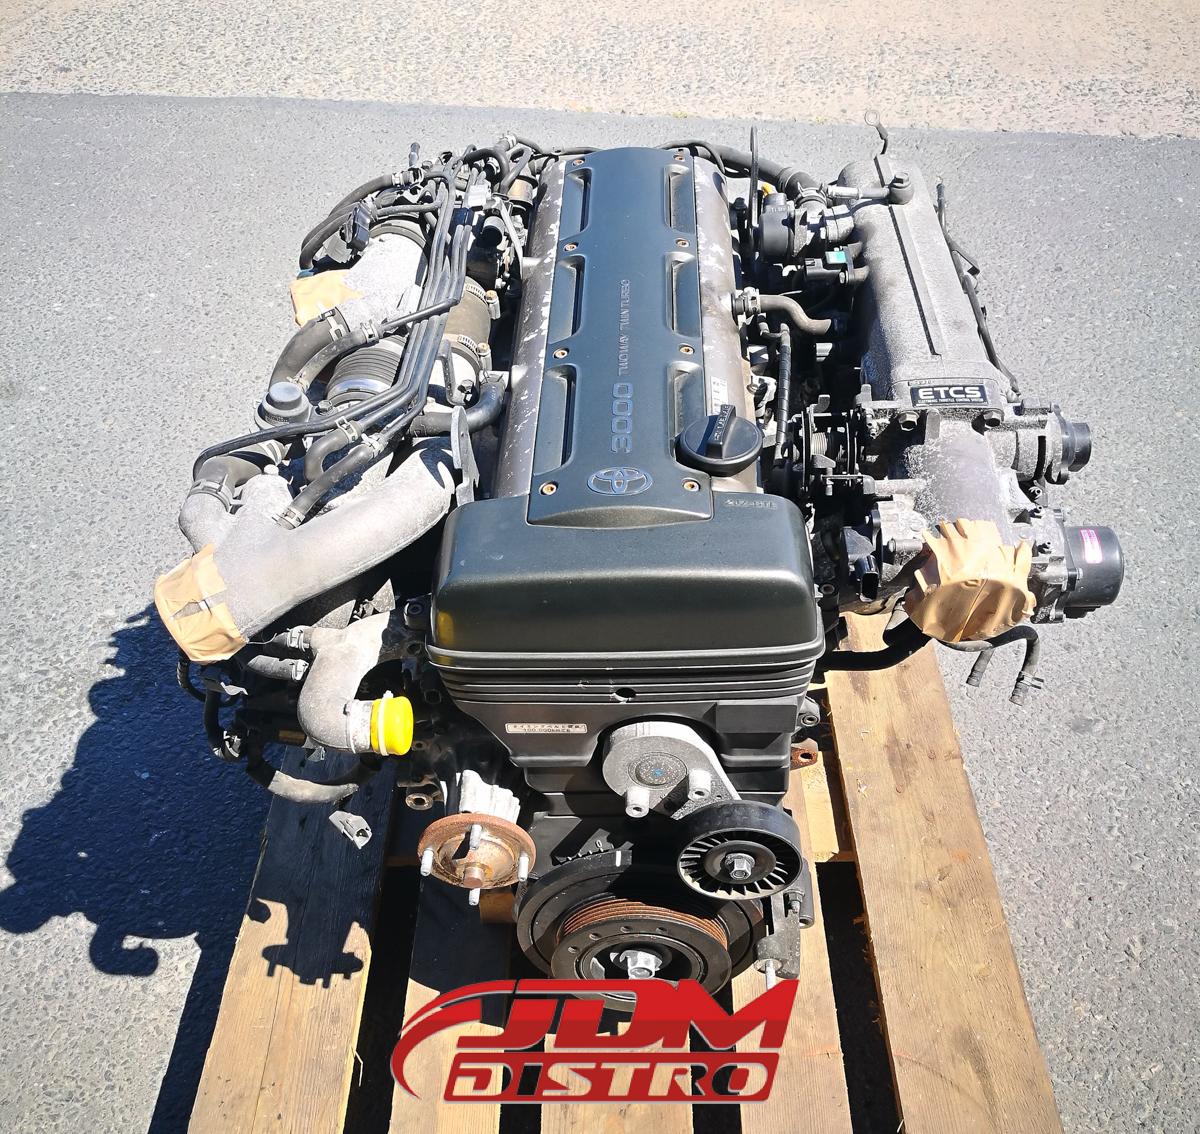 2jzgte Complete Engine: TOYOTA SUPRA MKIV JZA80 2JZGTE NON-VVTI ENGINE